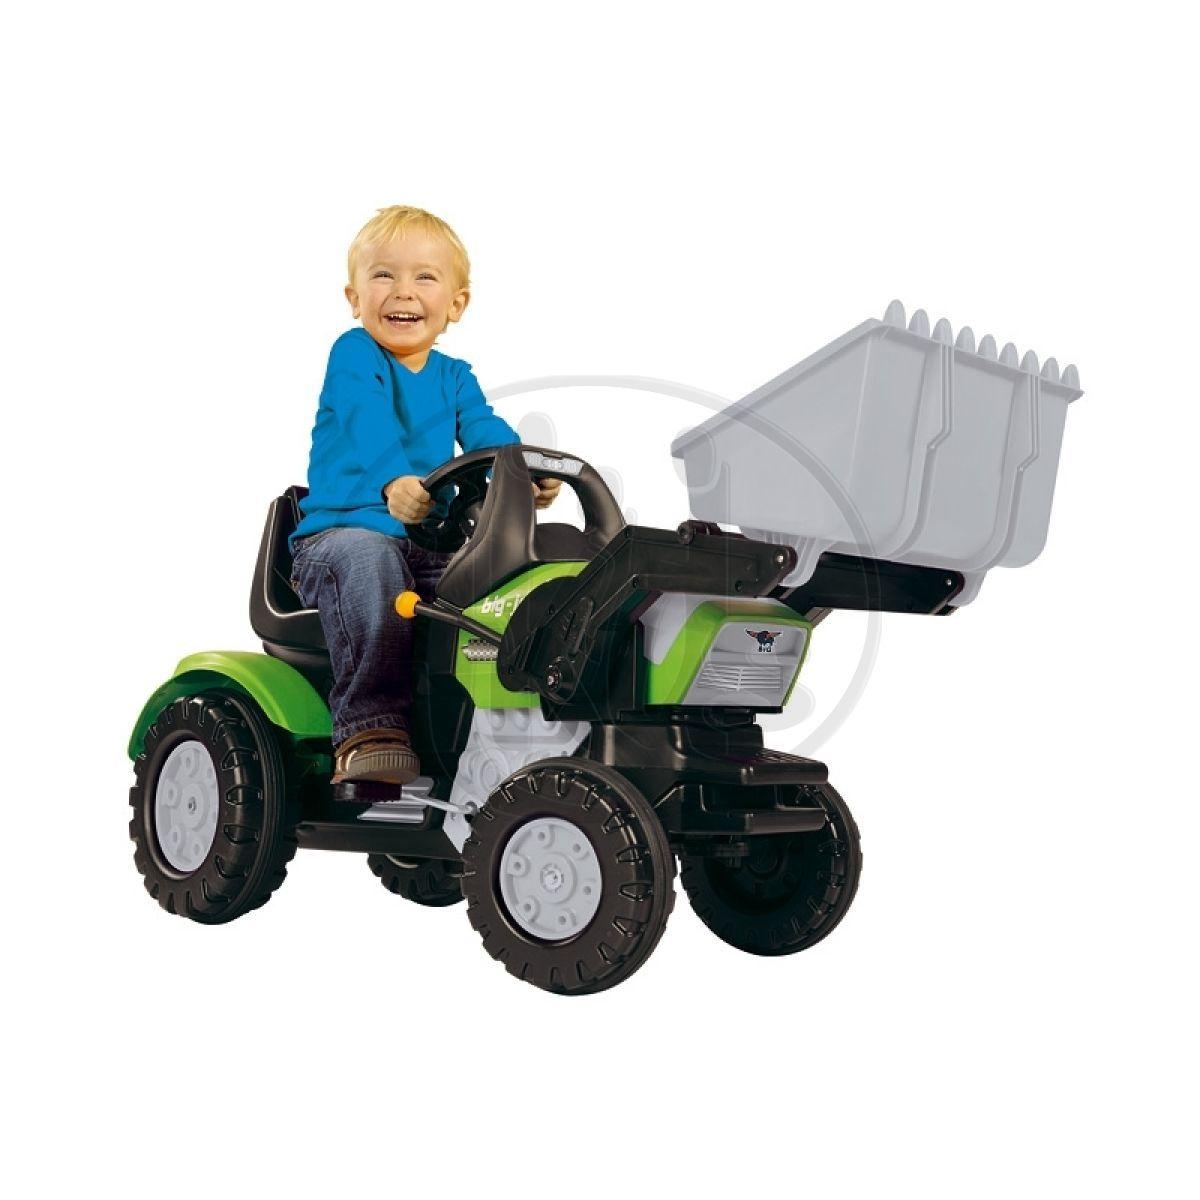 big lapac traktor john xl se l c 4kids. Black Bedroom Furniture Sets. Home Design Ideas